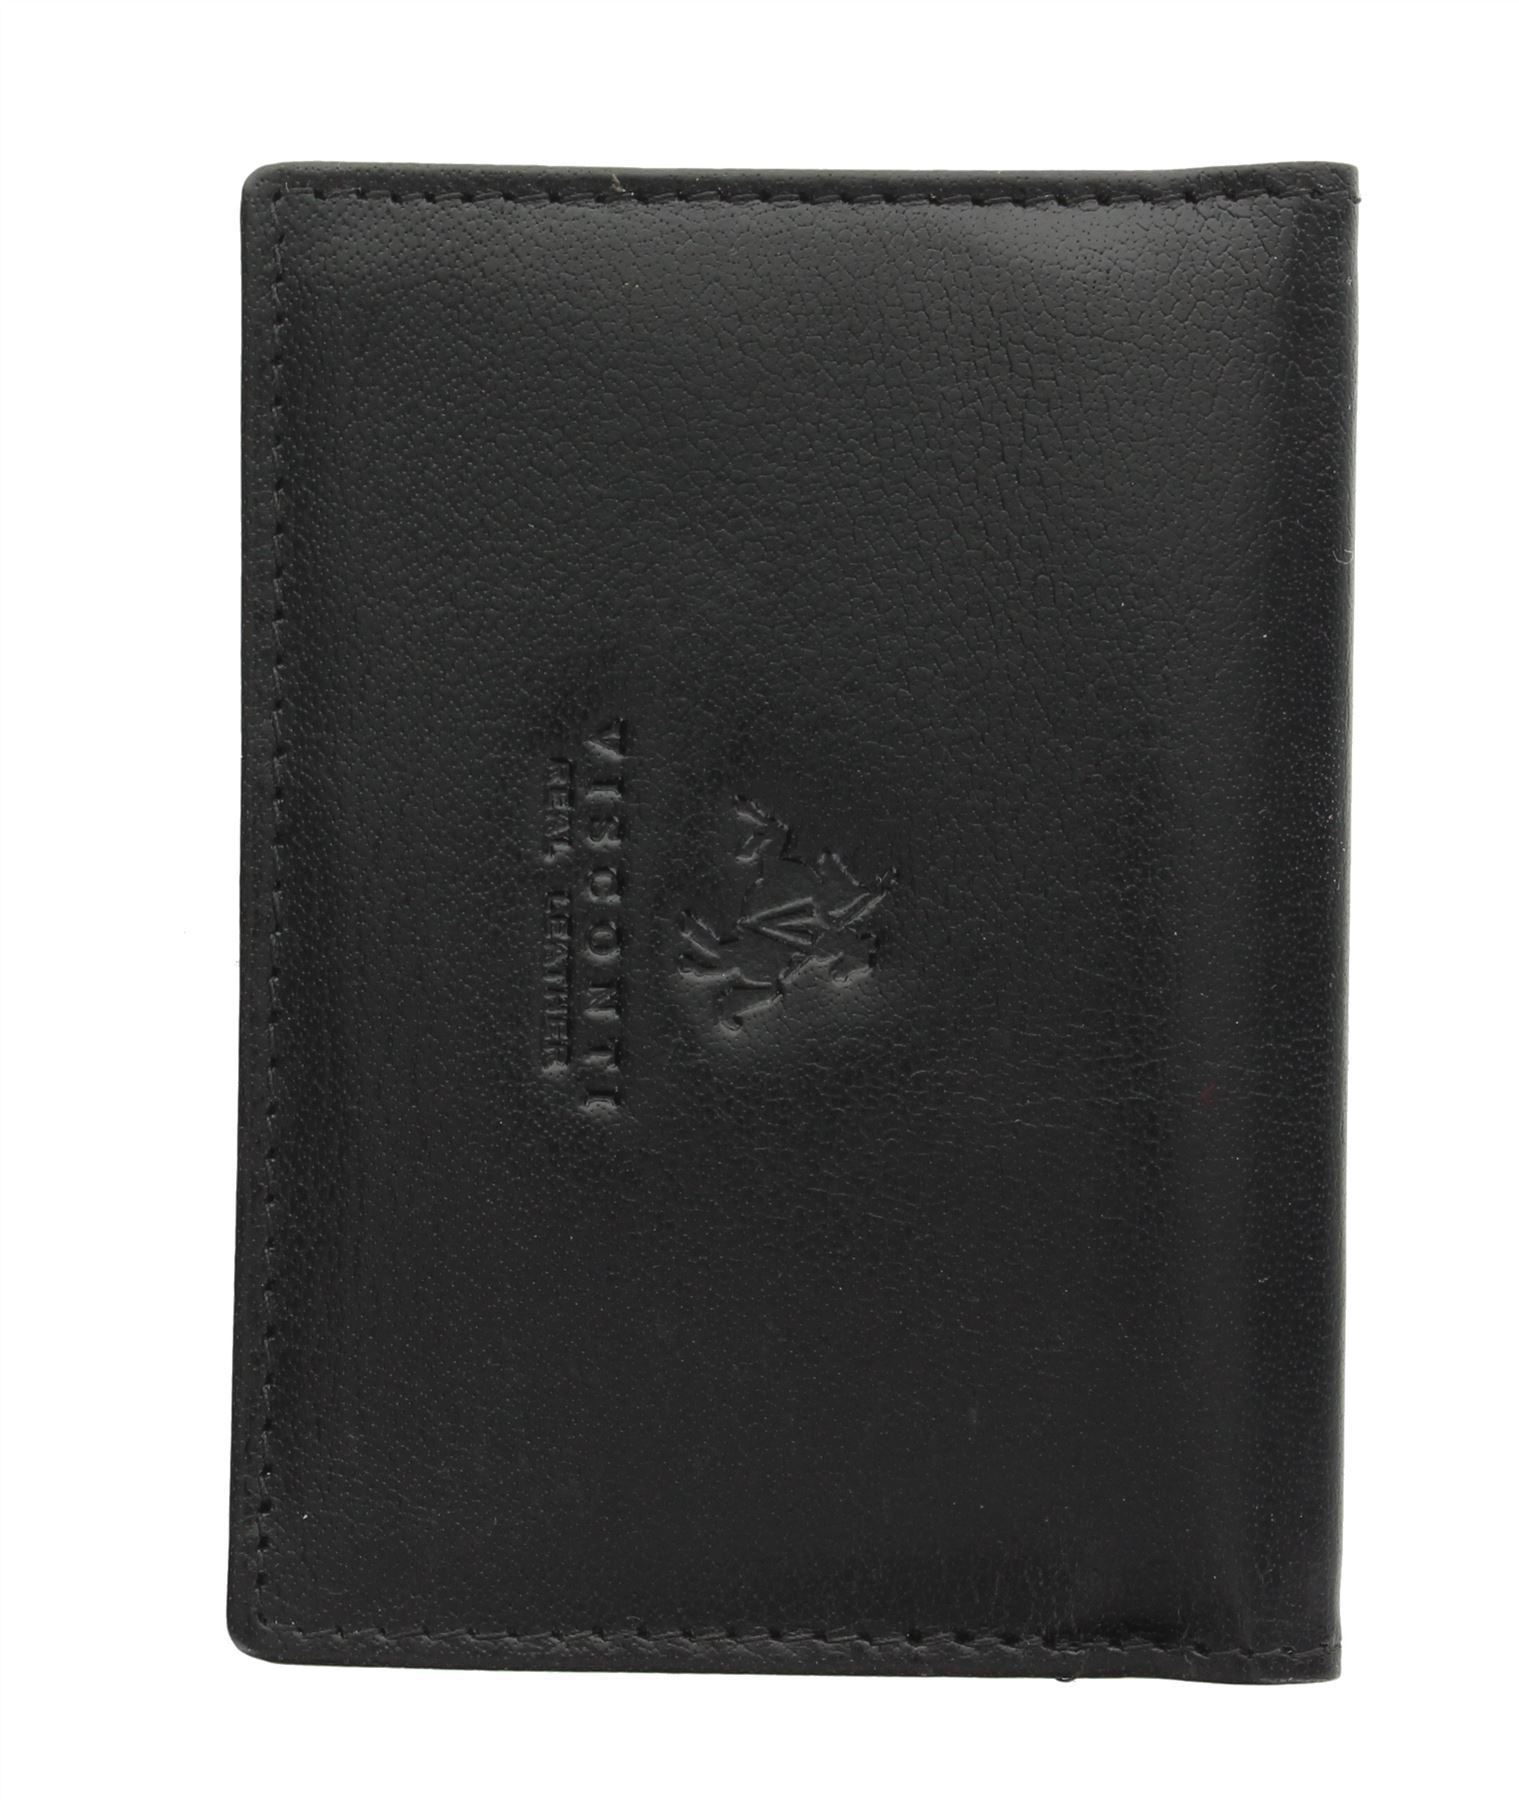 Visconti Leather Credit Card Holder TC1